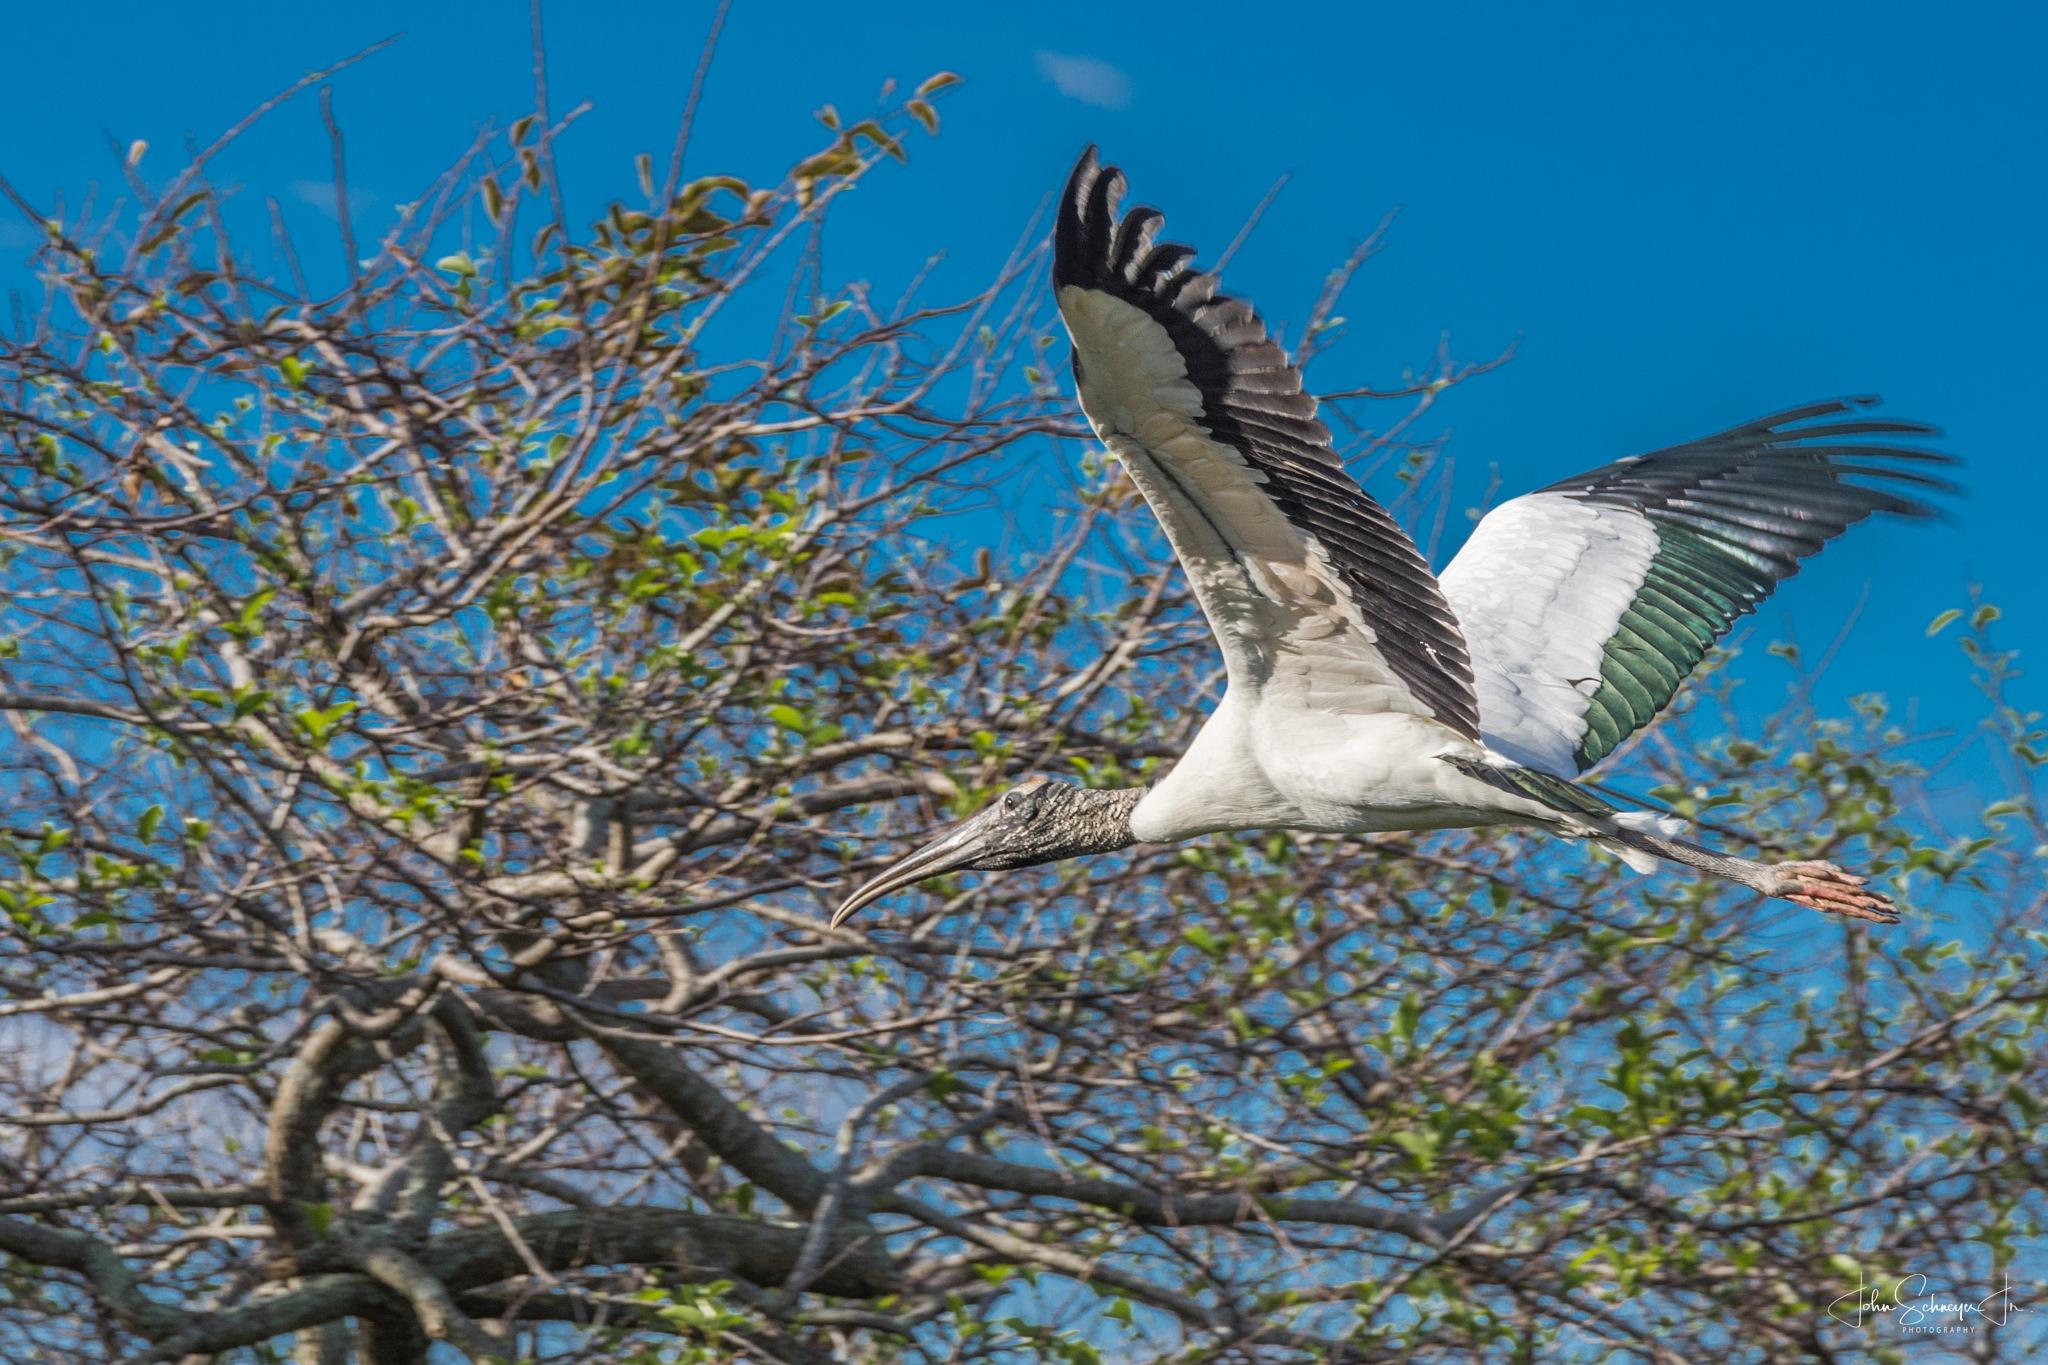 Soaring Stork by John Schneyer